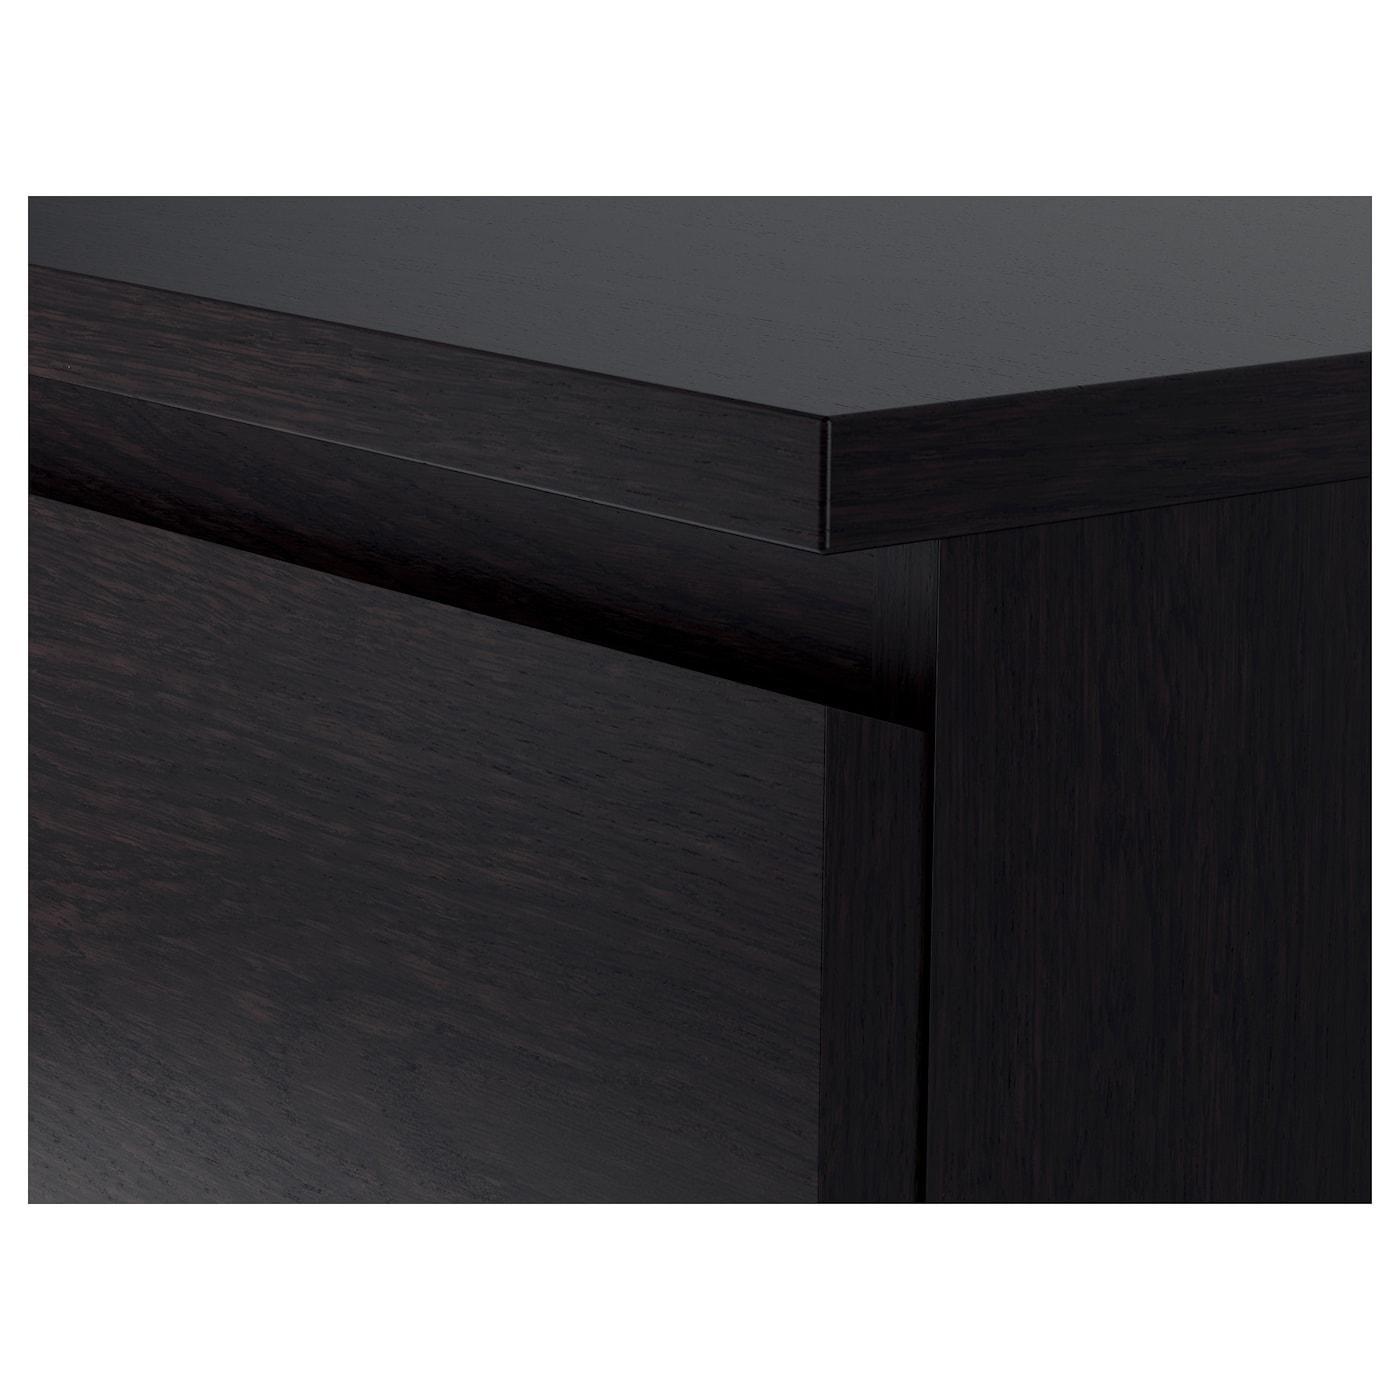 "MALM 4-drawer chest black-brown 31 1/2 "" 18 7/8 "" 39 3/8 "" 16 7/8 """